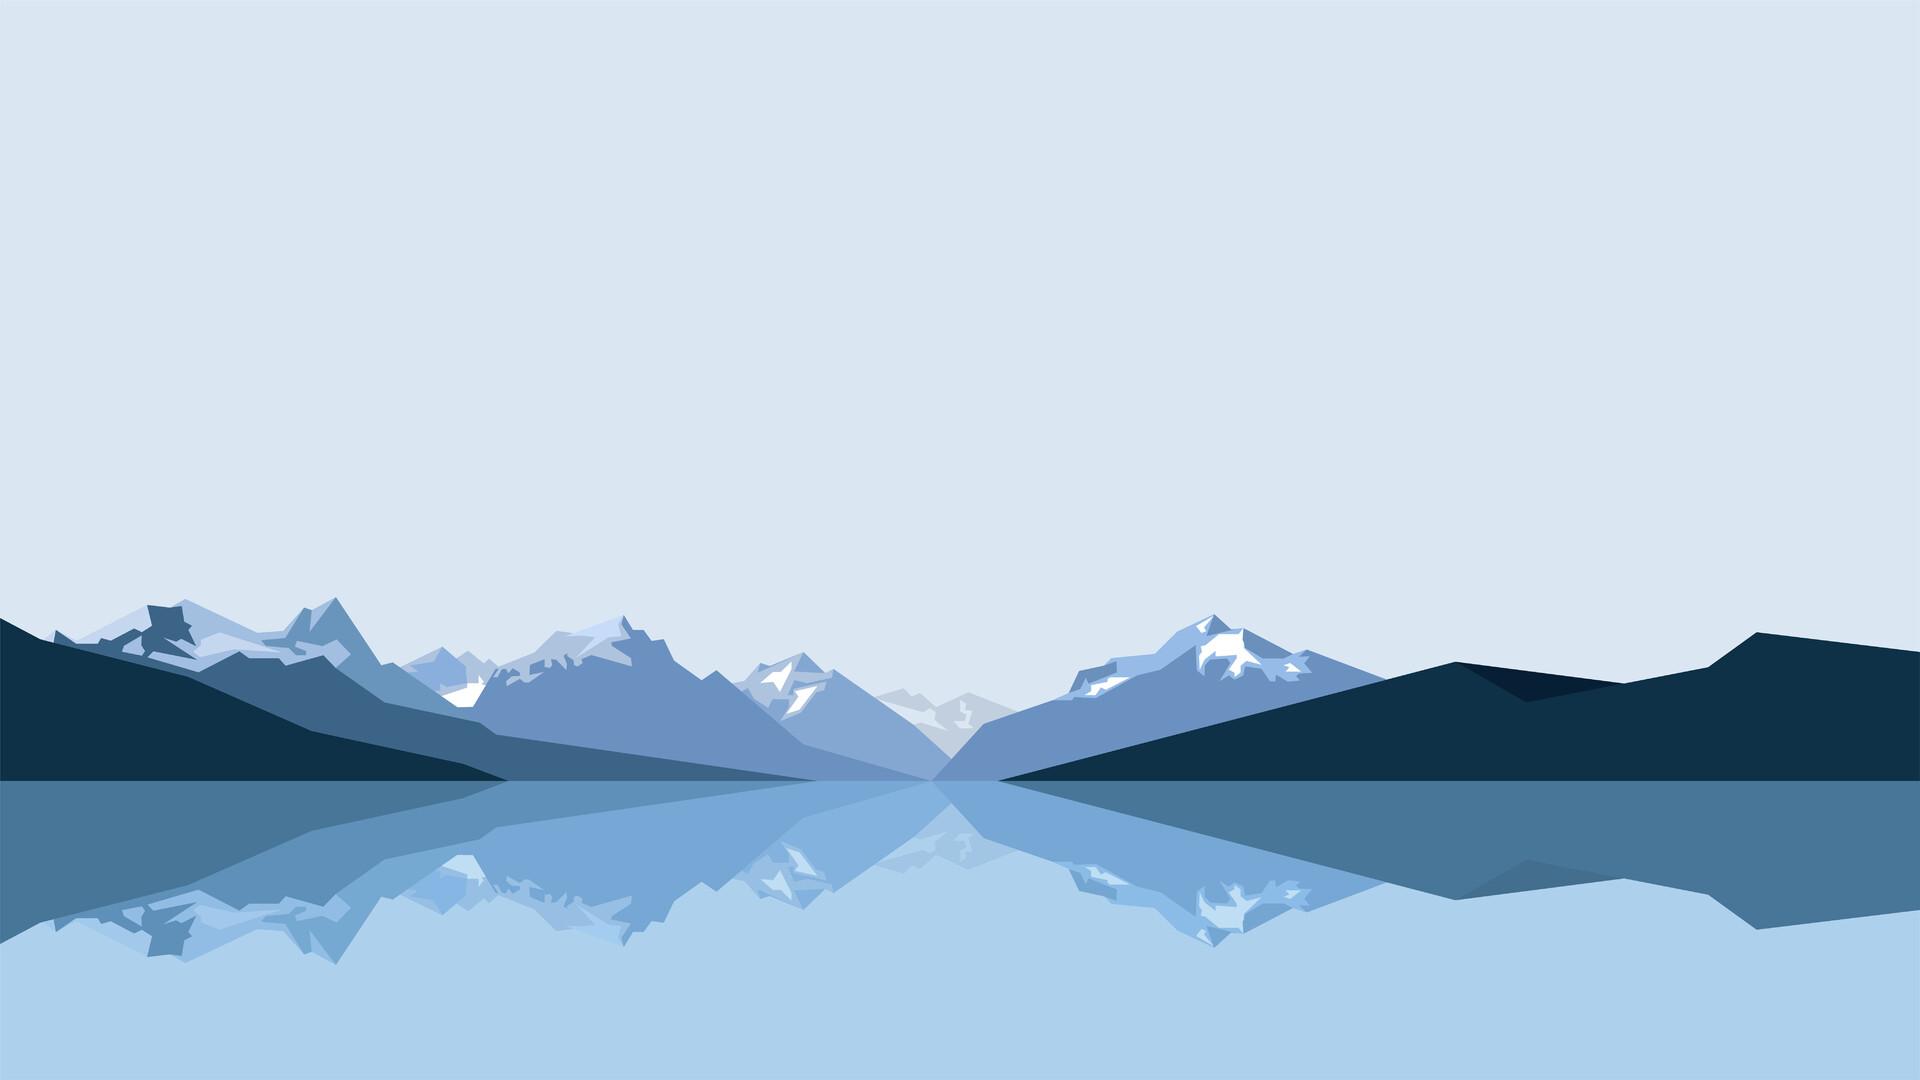 1920x1080 Minimalist Blue Mountains 8k Laptop Full Hd 1080p Hd 4k